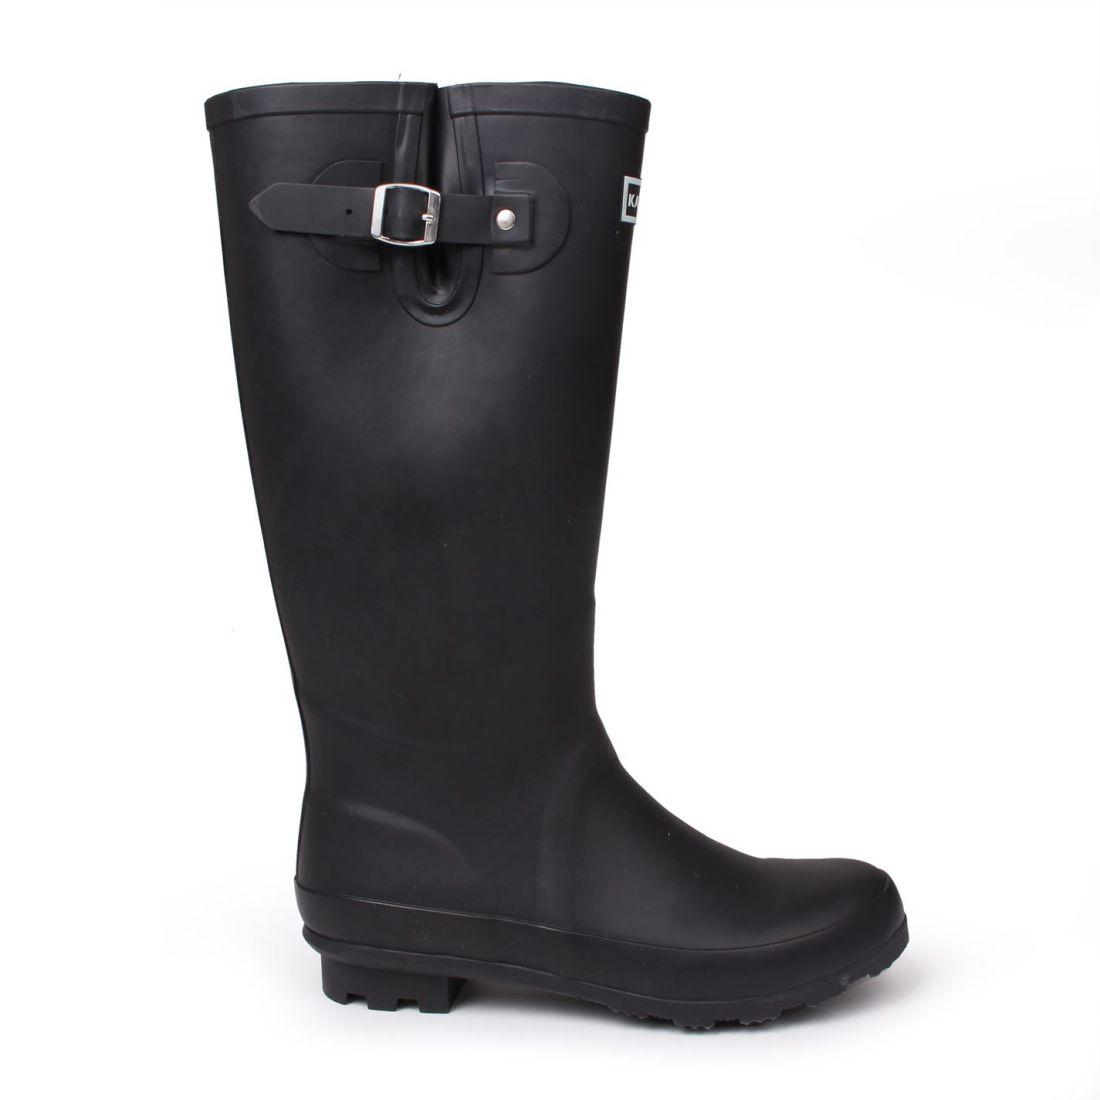 Image is loading Kangol-Womens-Tall-Wellies-Ladies-Wellington-Boots-Rubber- ba8e427846d